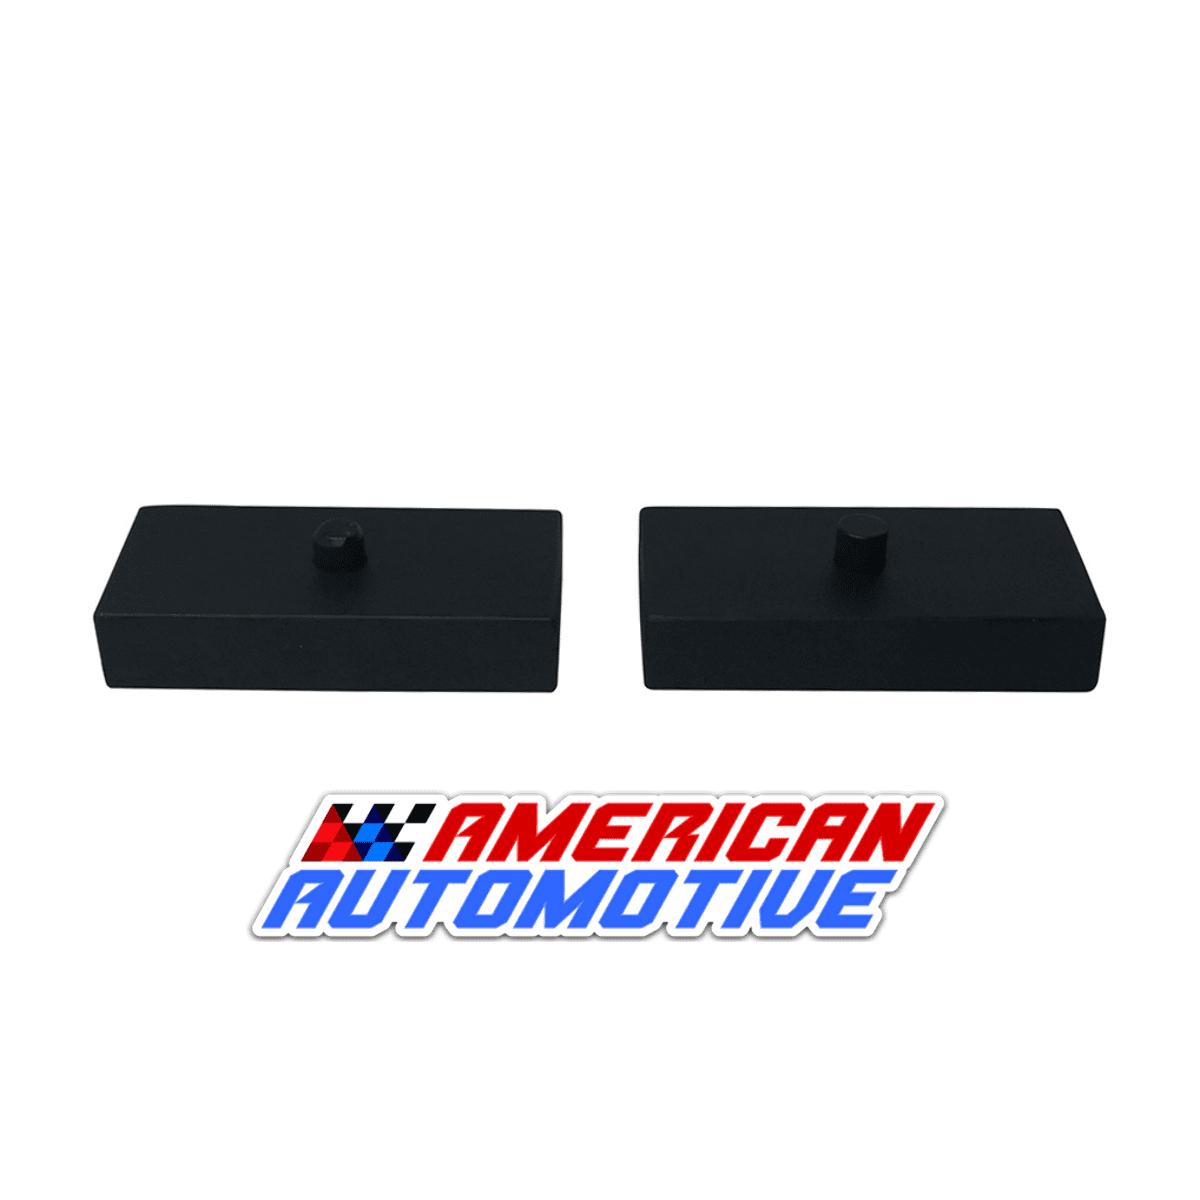 "Rear Lift Kit 1/"" Steel Blocks U-Bolts 2000-2013 Chevy Suburban 2500 8-LUG"